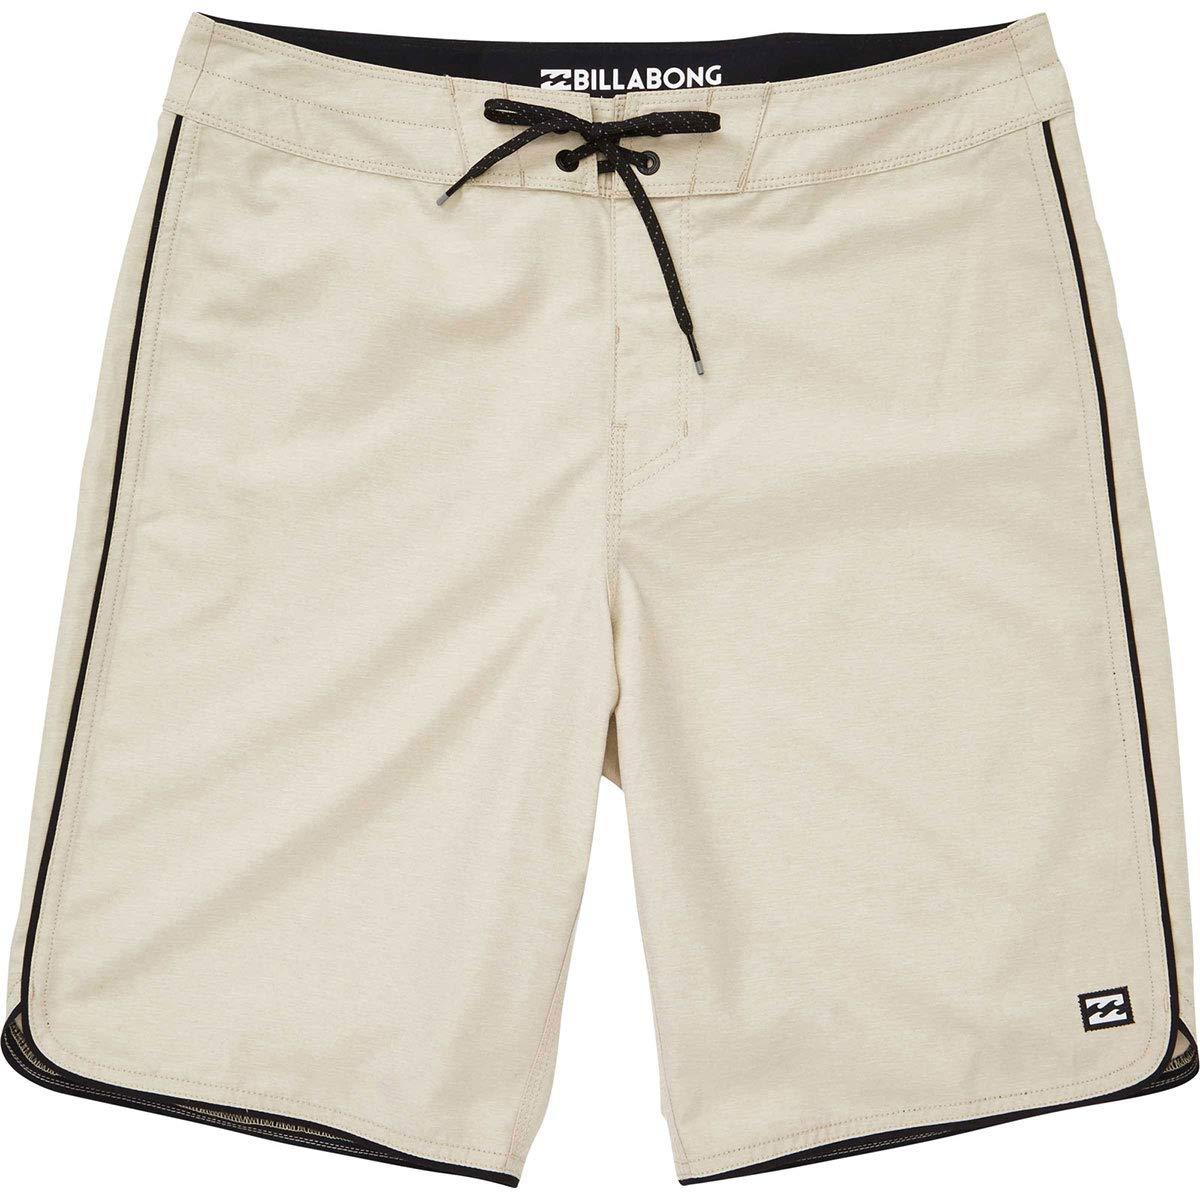 JiJingHeWang Plan Mens Casual Shorts Pants